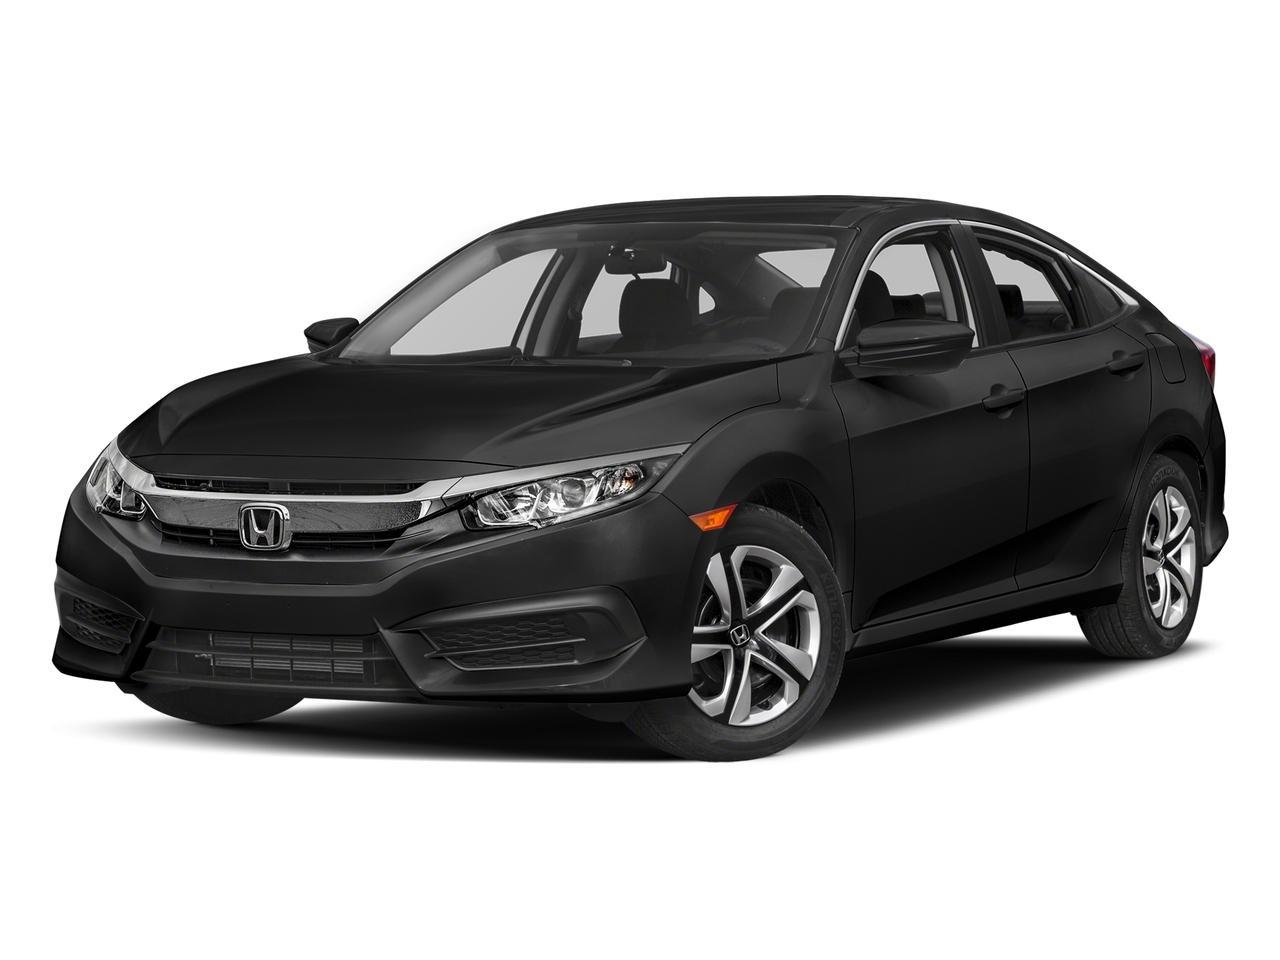 2017 Honda Civic Sedan Vehicle Photo in Harrisburg, PA 17112